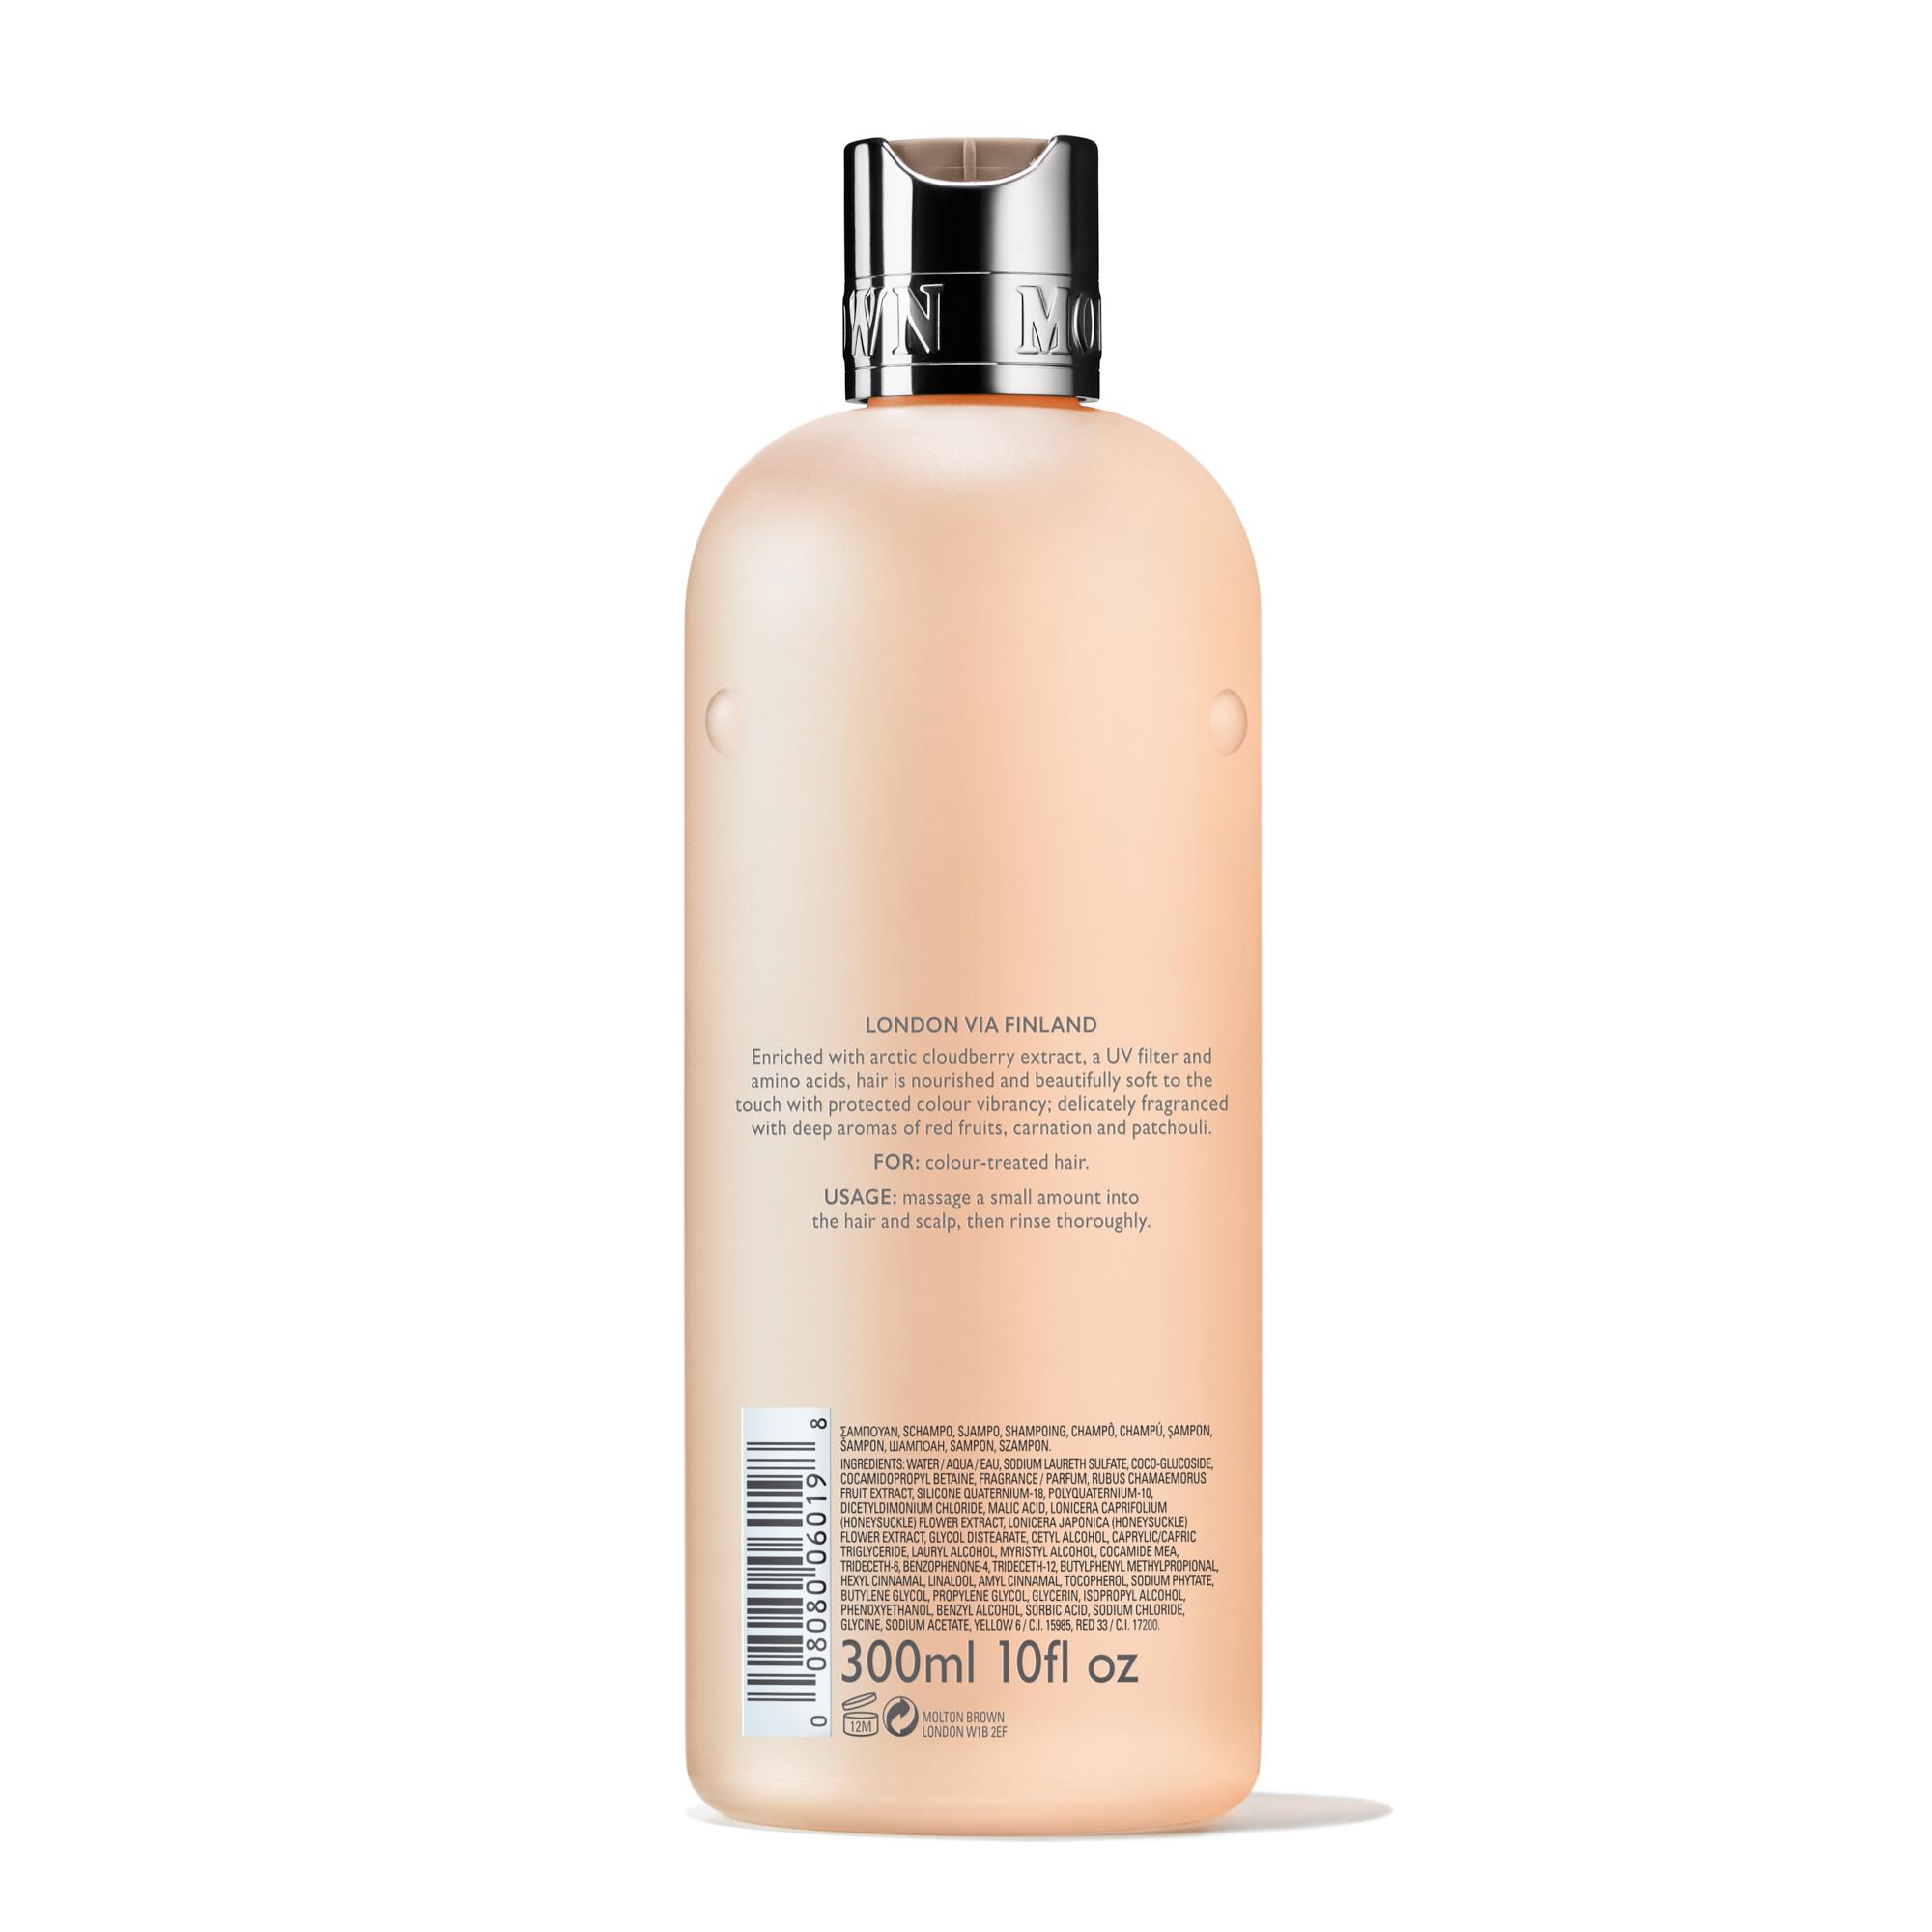 Nurturing Shampoo with Cloudberry